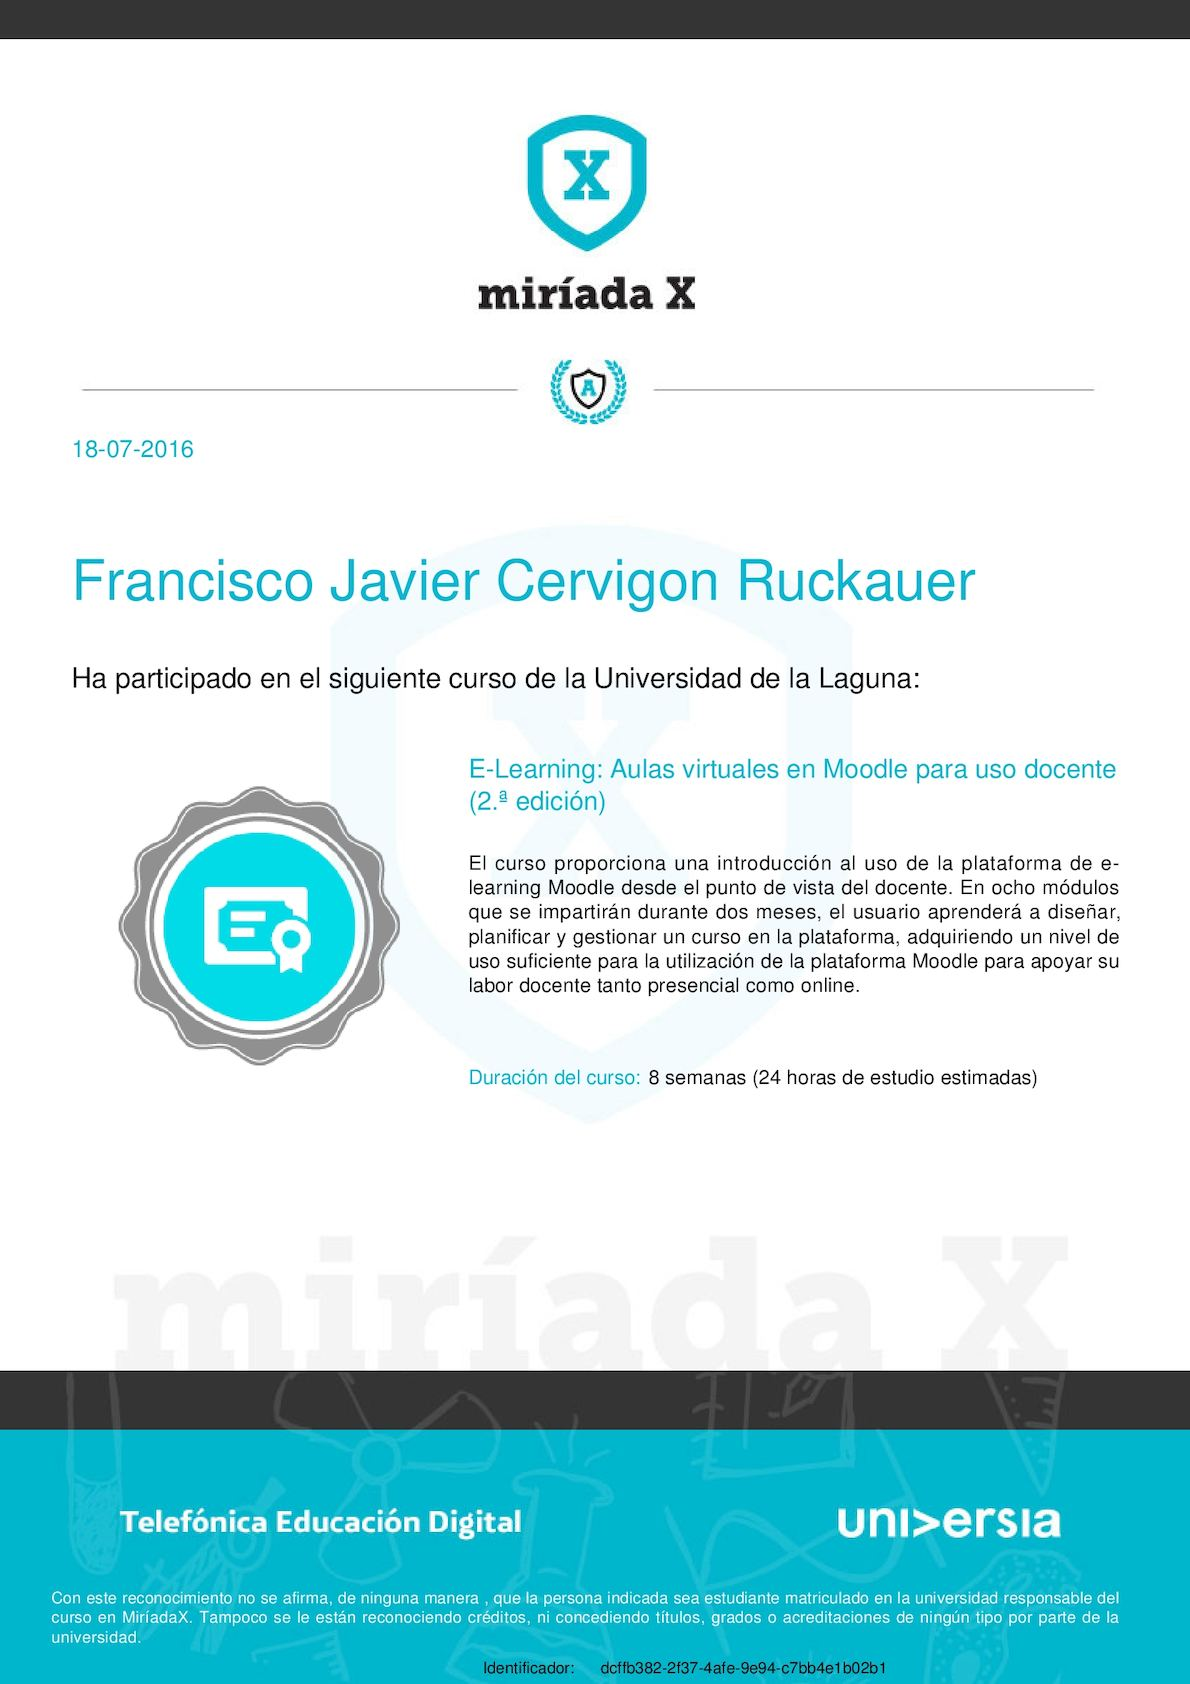 E Learning, Aulas Virtuales En Moodle Para Uso Docente, Francisco Javier Cervigon Ruckauer Dcffb382 2f37 4afe 9e94 C7bb4e1b02b1